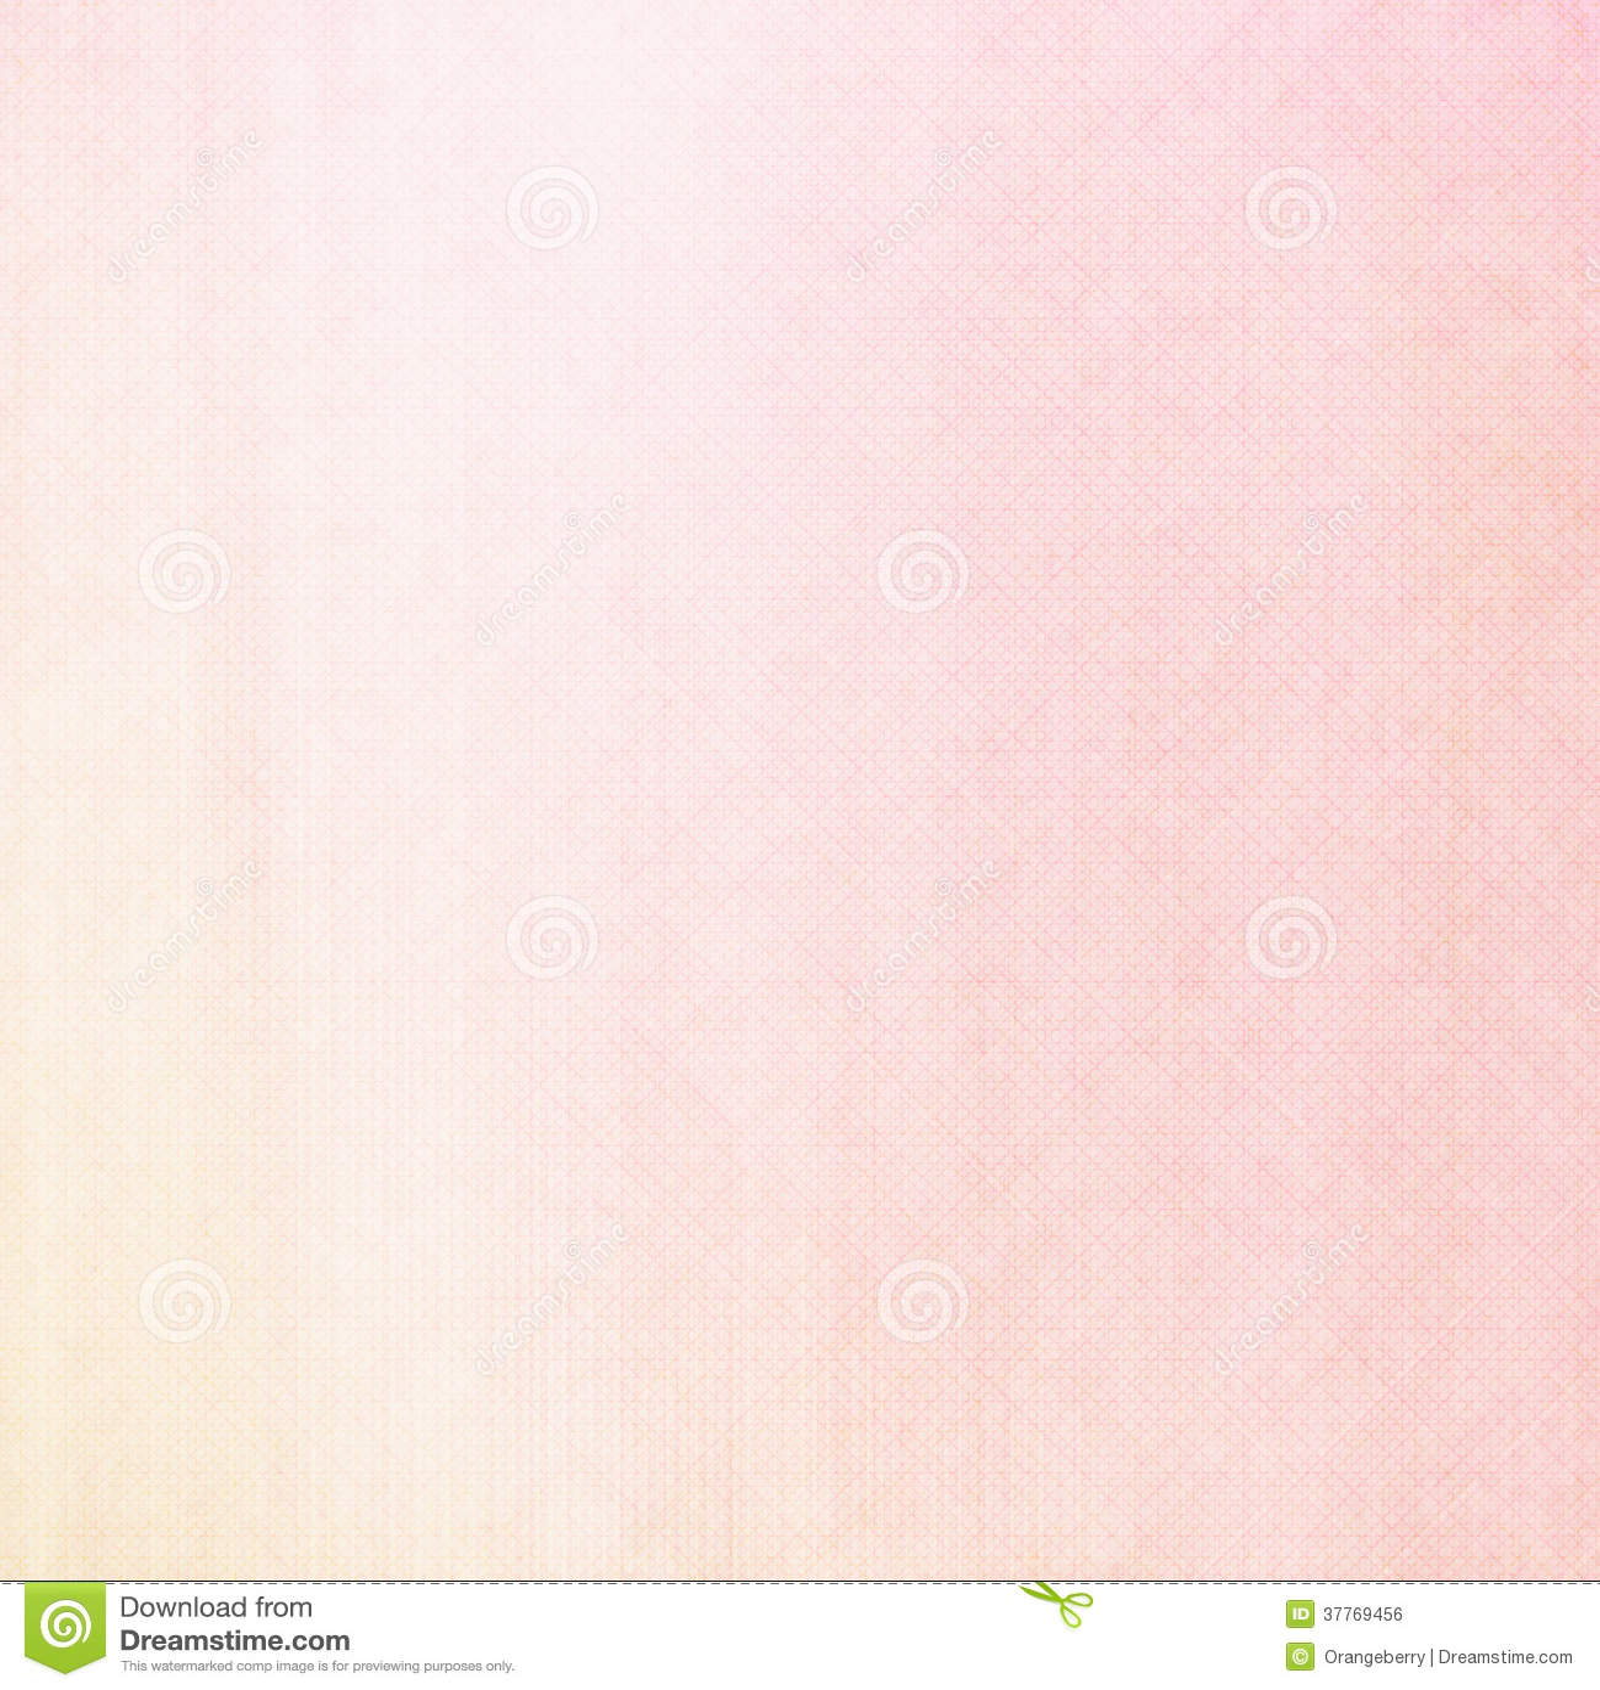 Pink Pastel Vintage Background Royalty Free Stock Image - Image ...